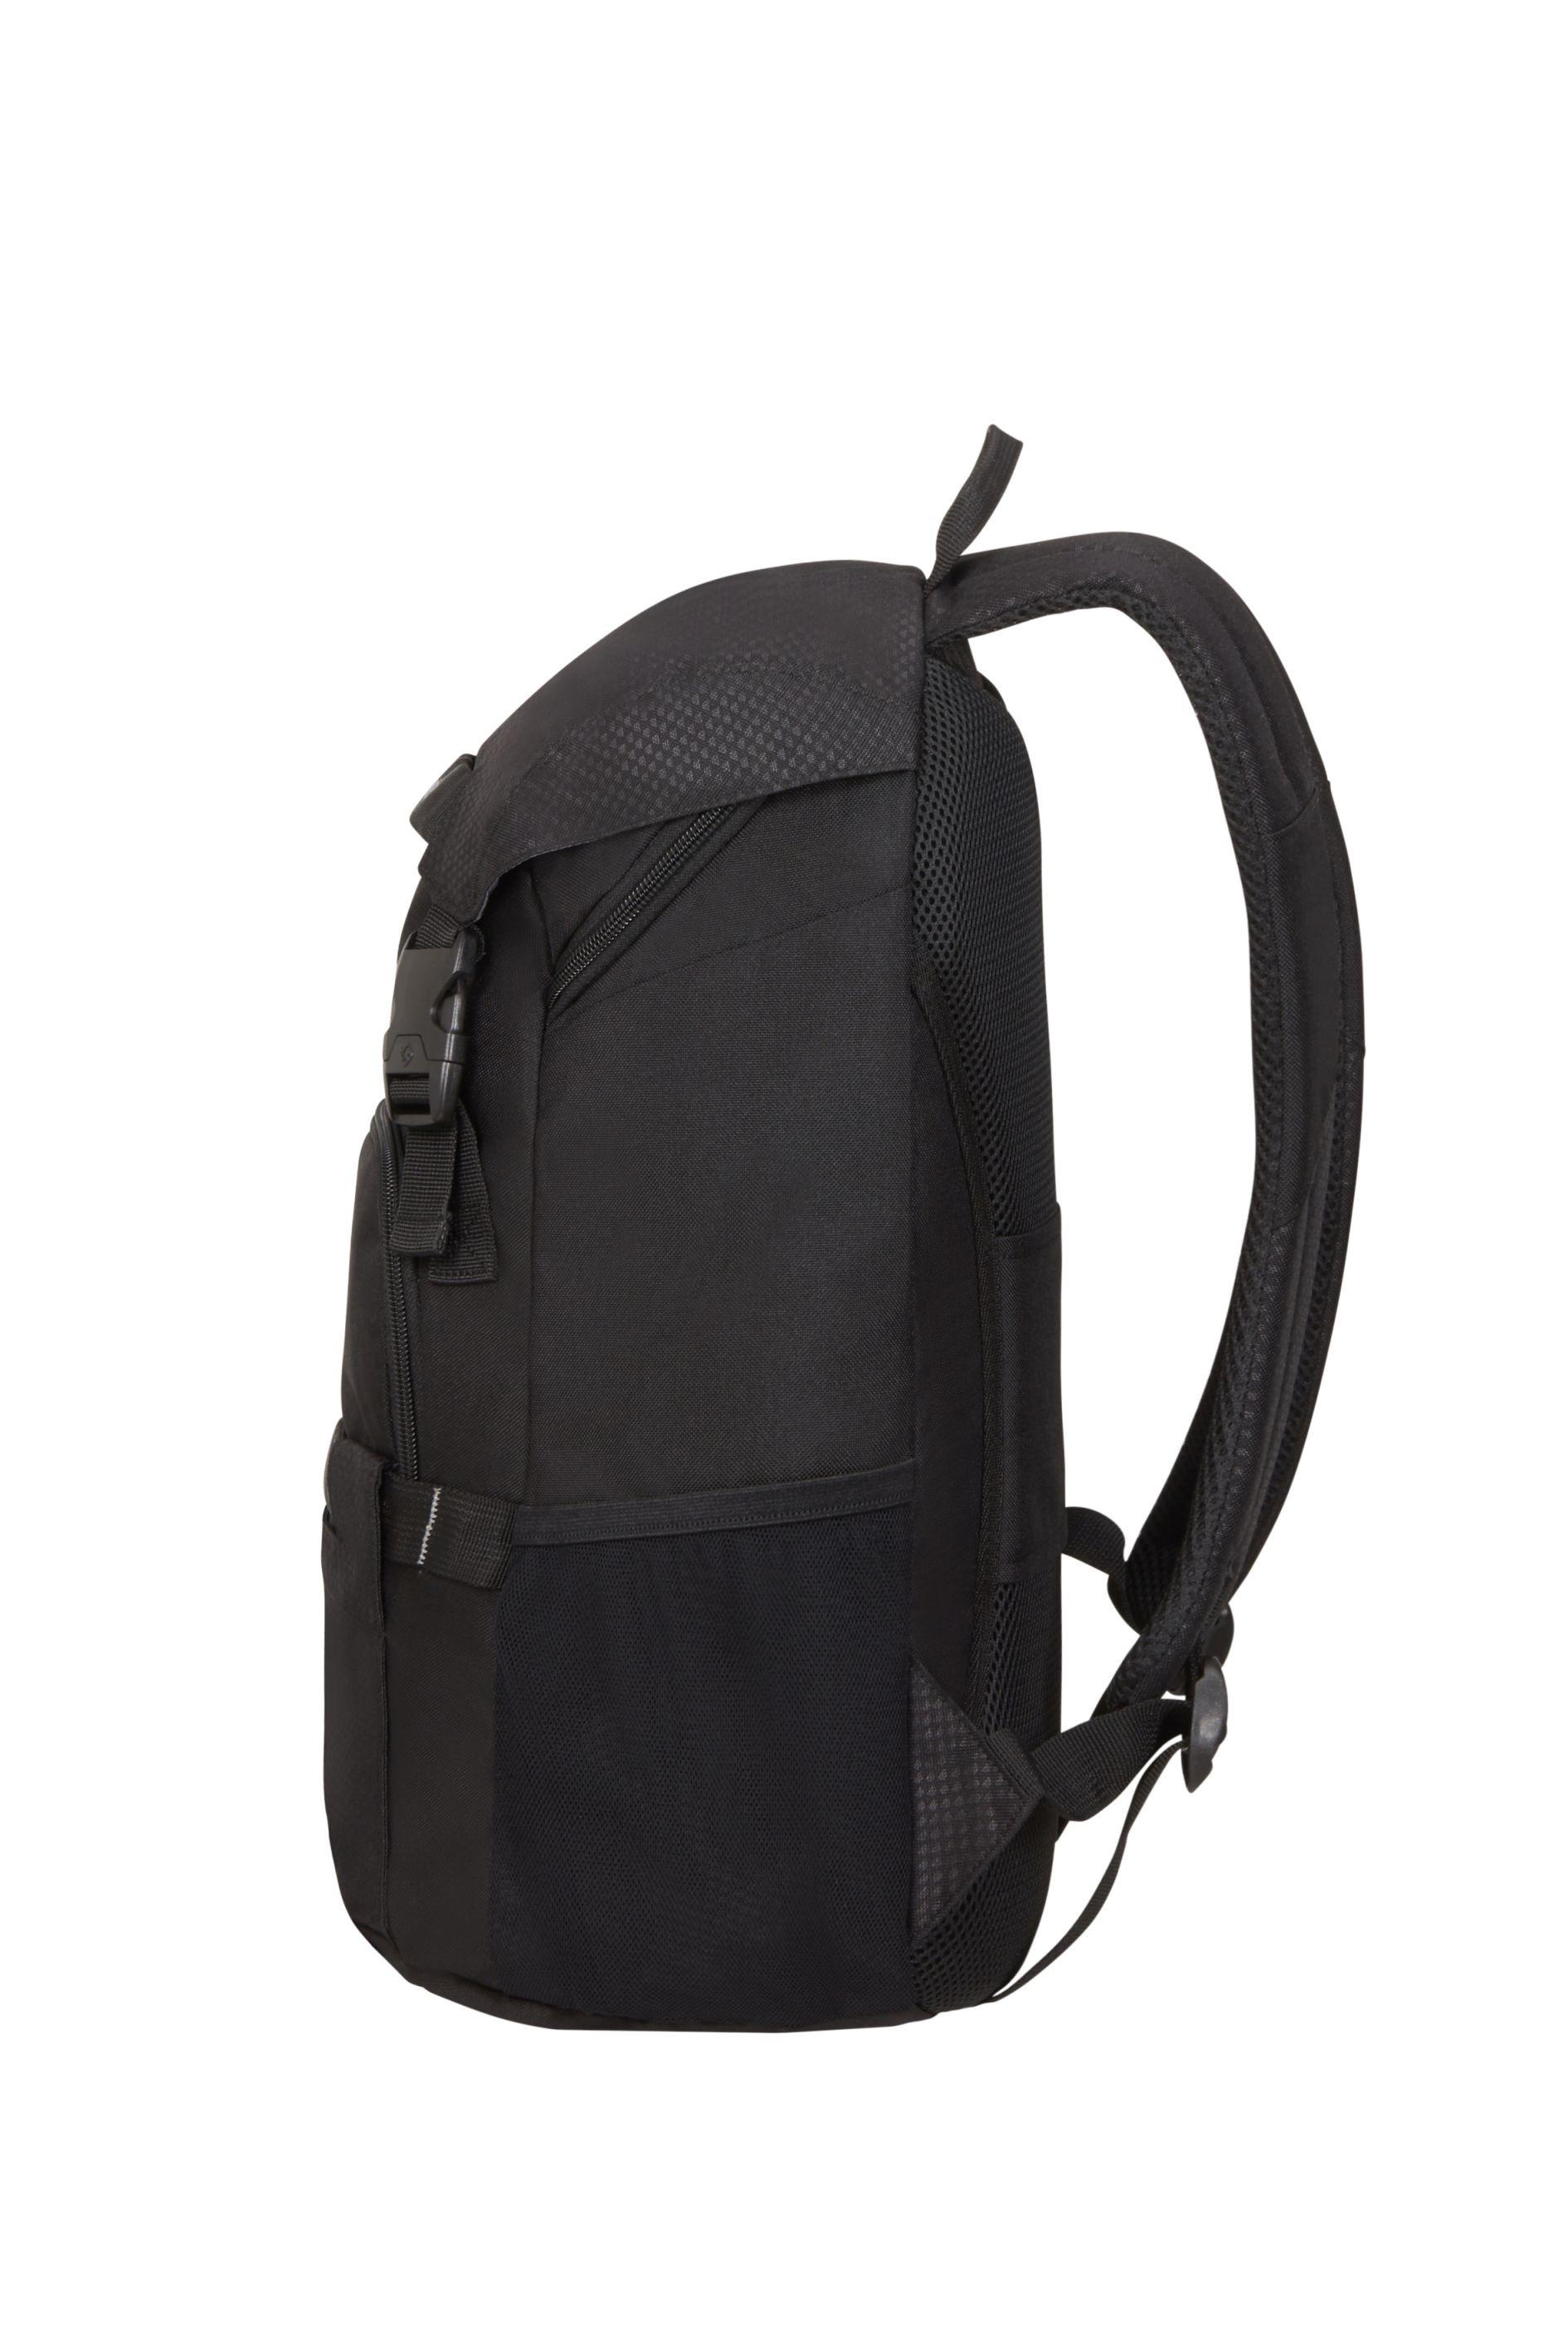 Samsonite Sonora Laptop Backpack M, View 7